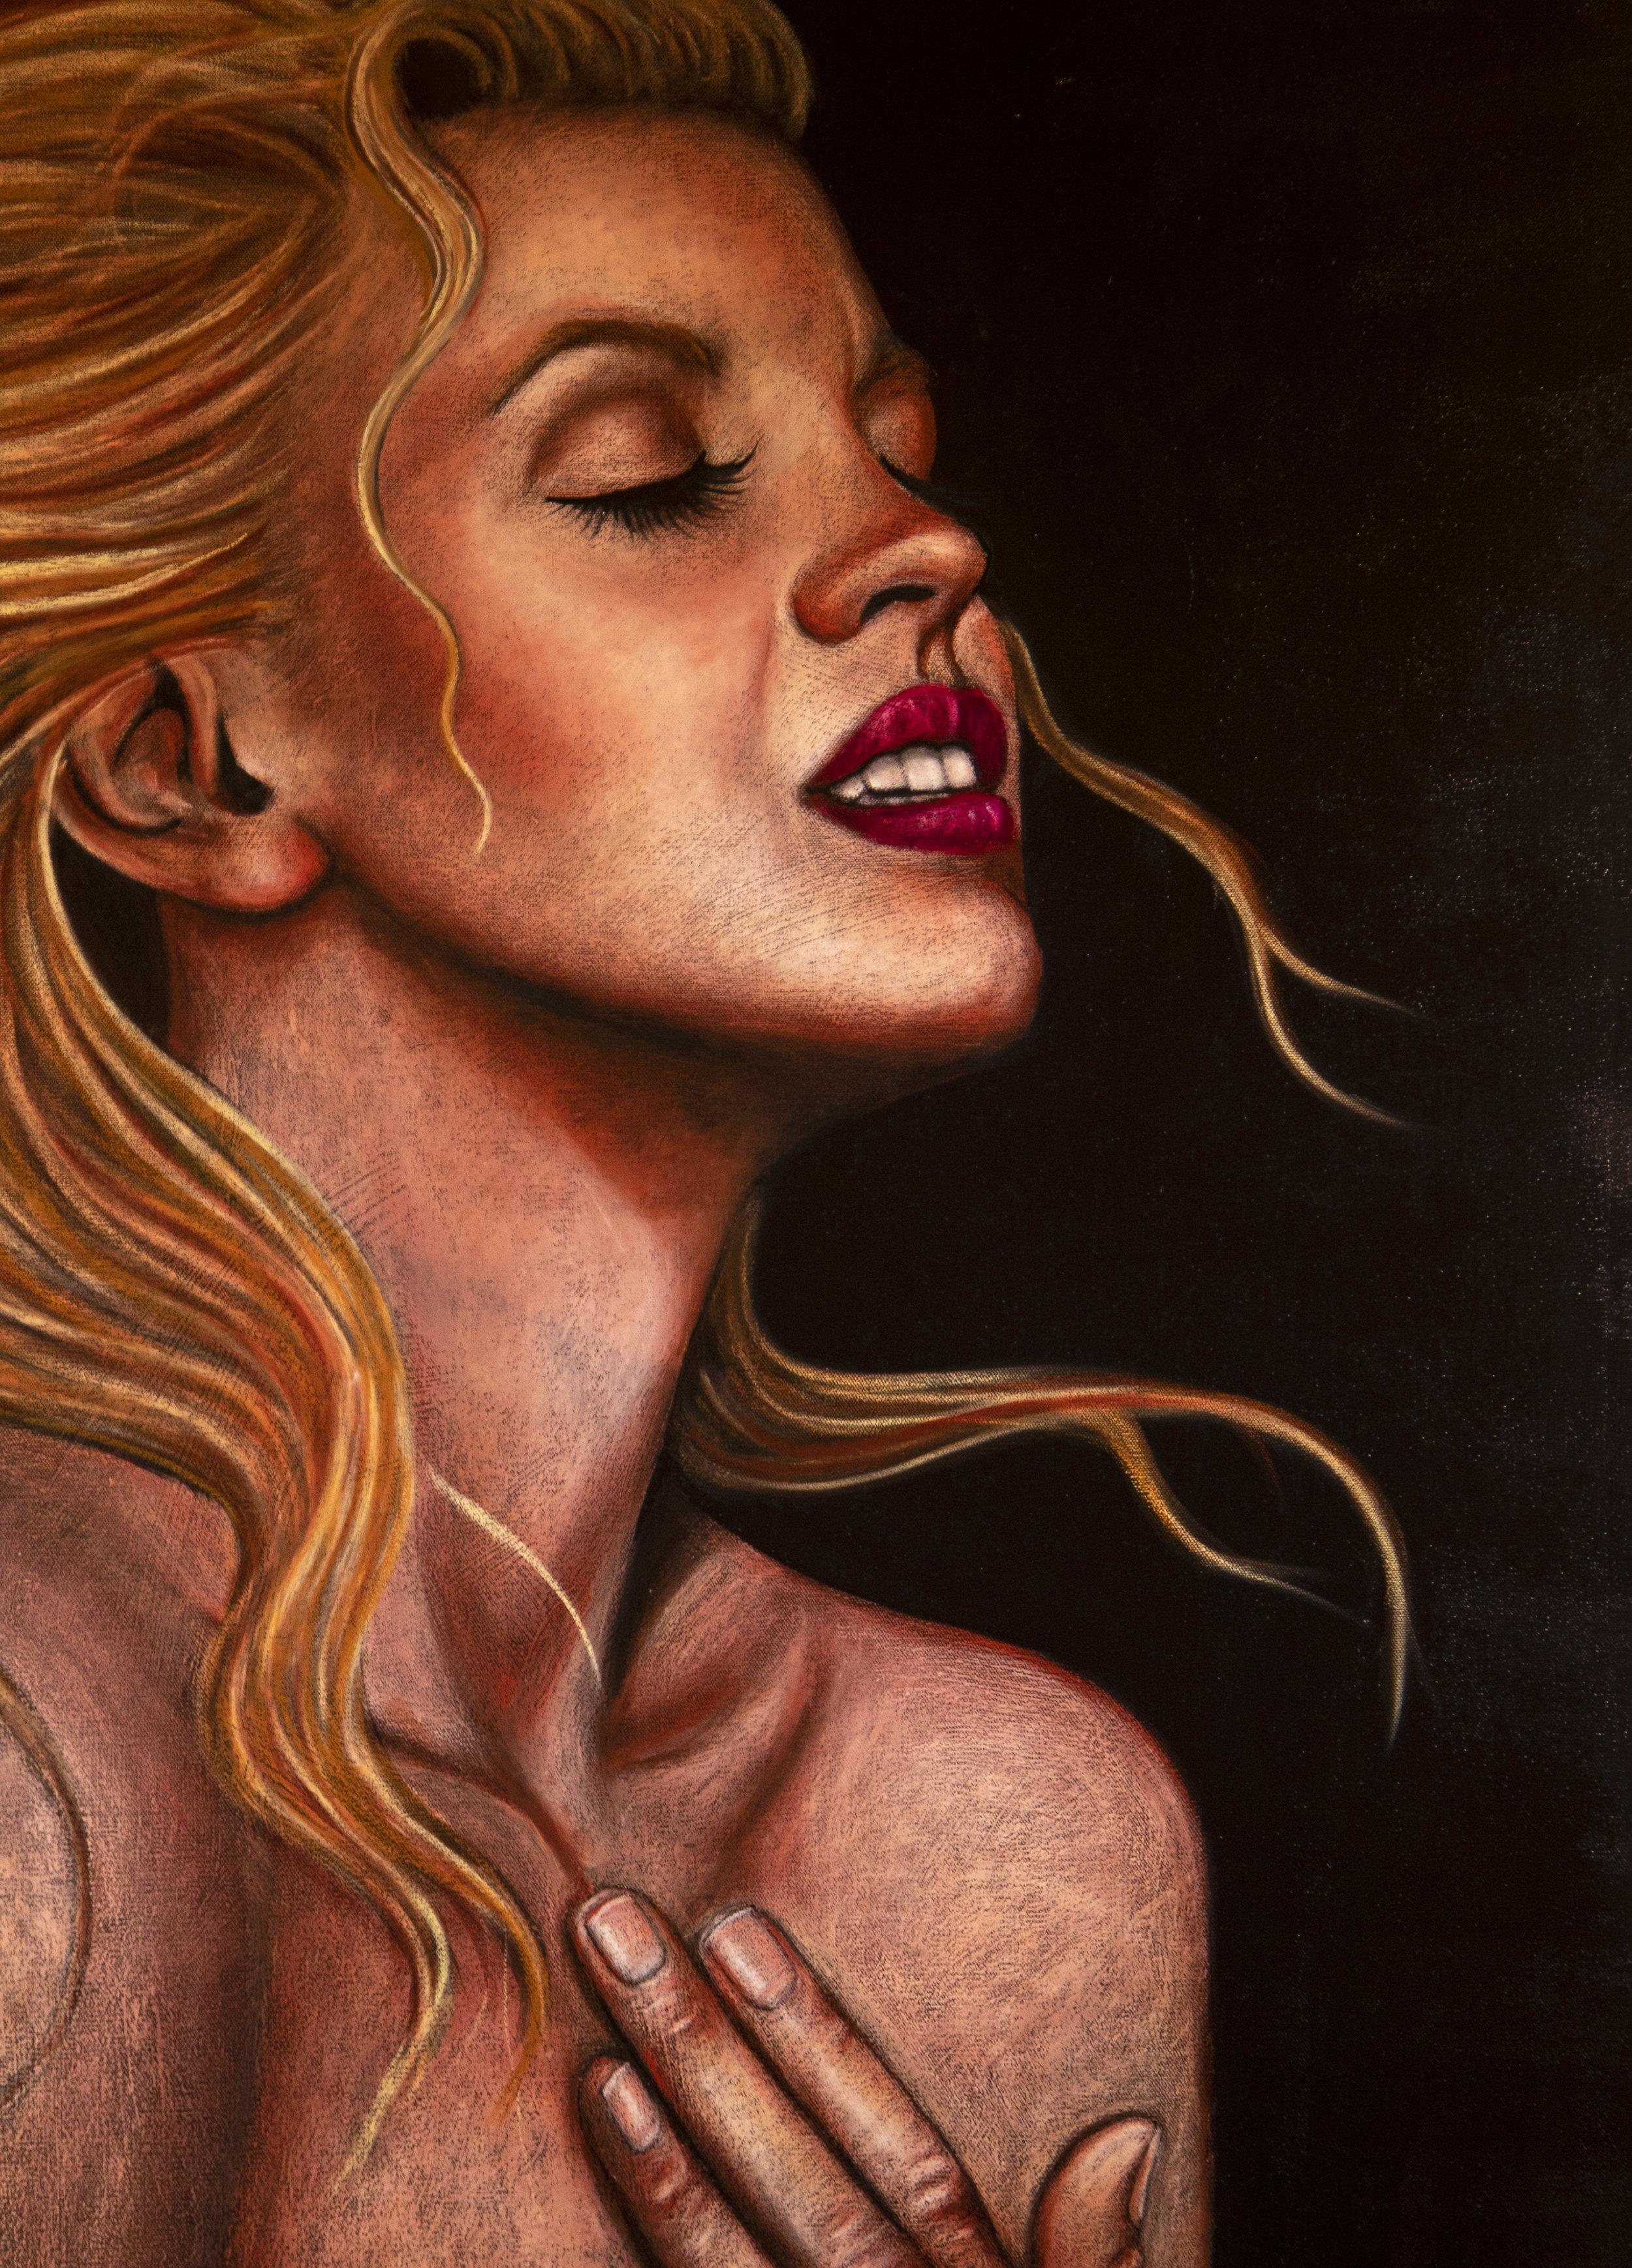 Marilyn Rising